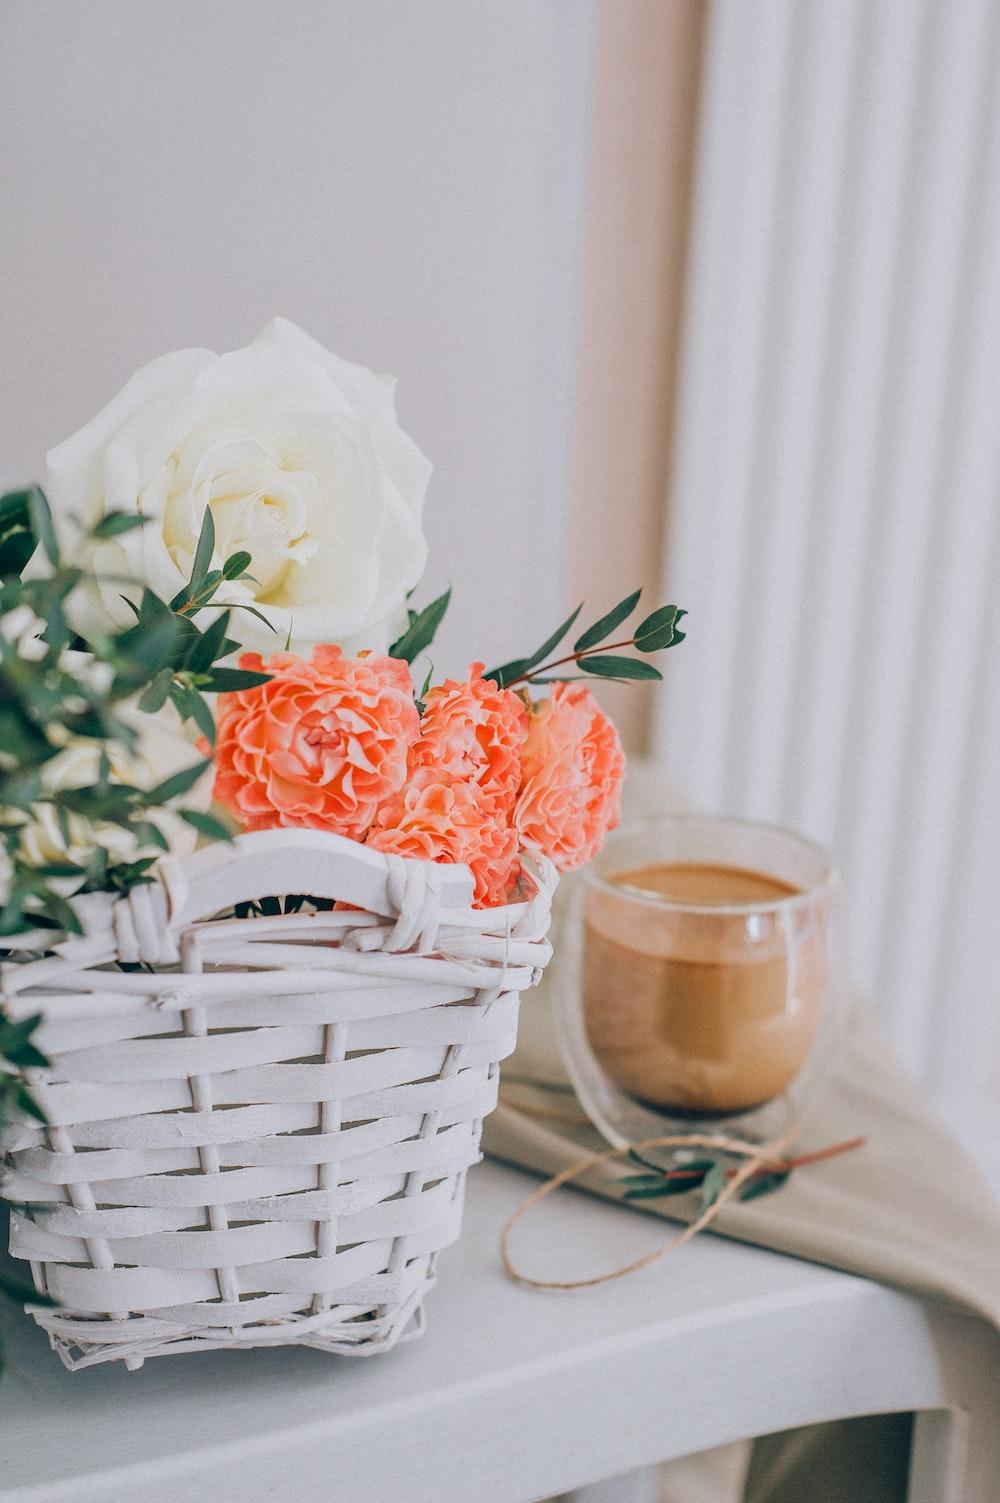 white rose in white wicker basket